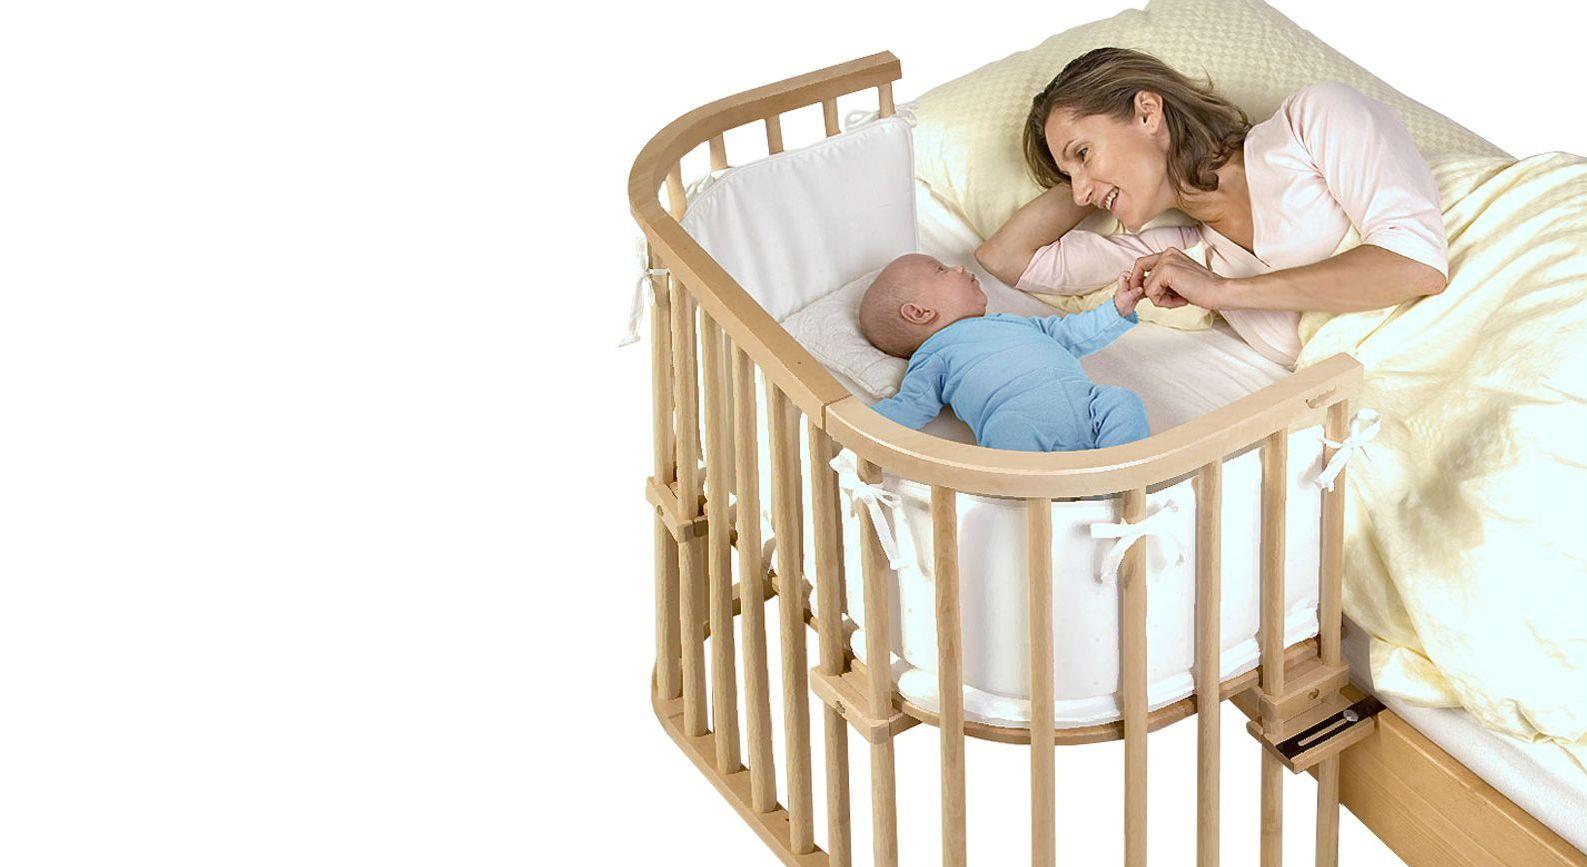 Beistellbett BabyBay Original aus Buche natur lackiert